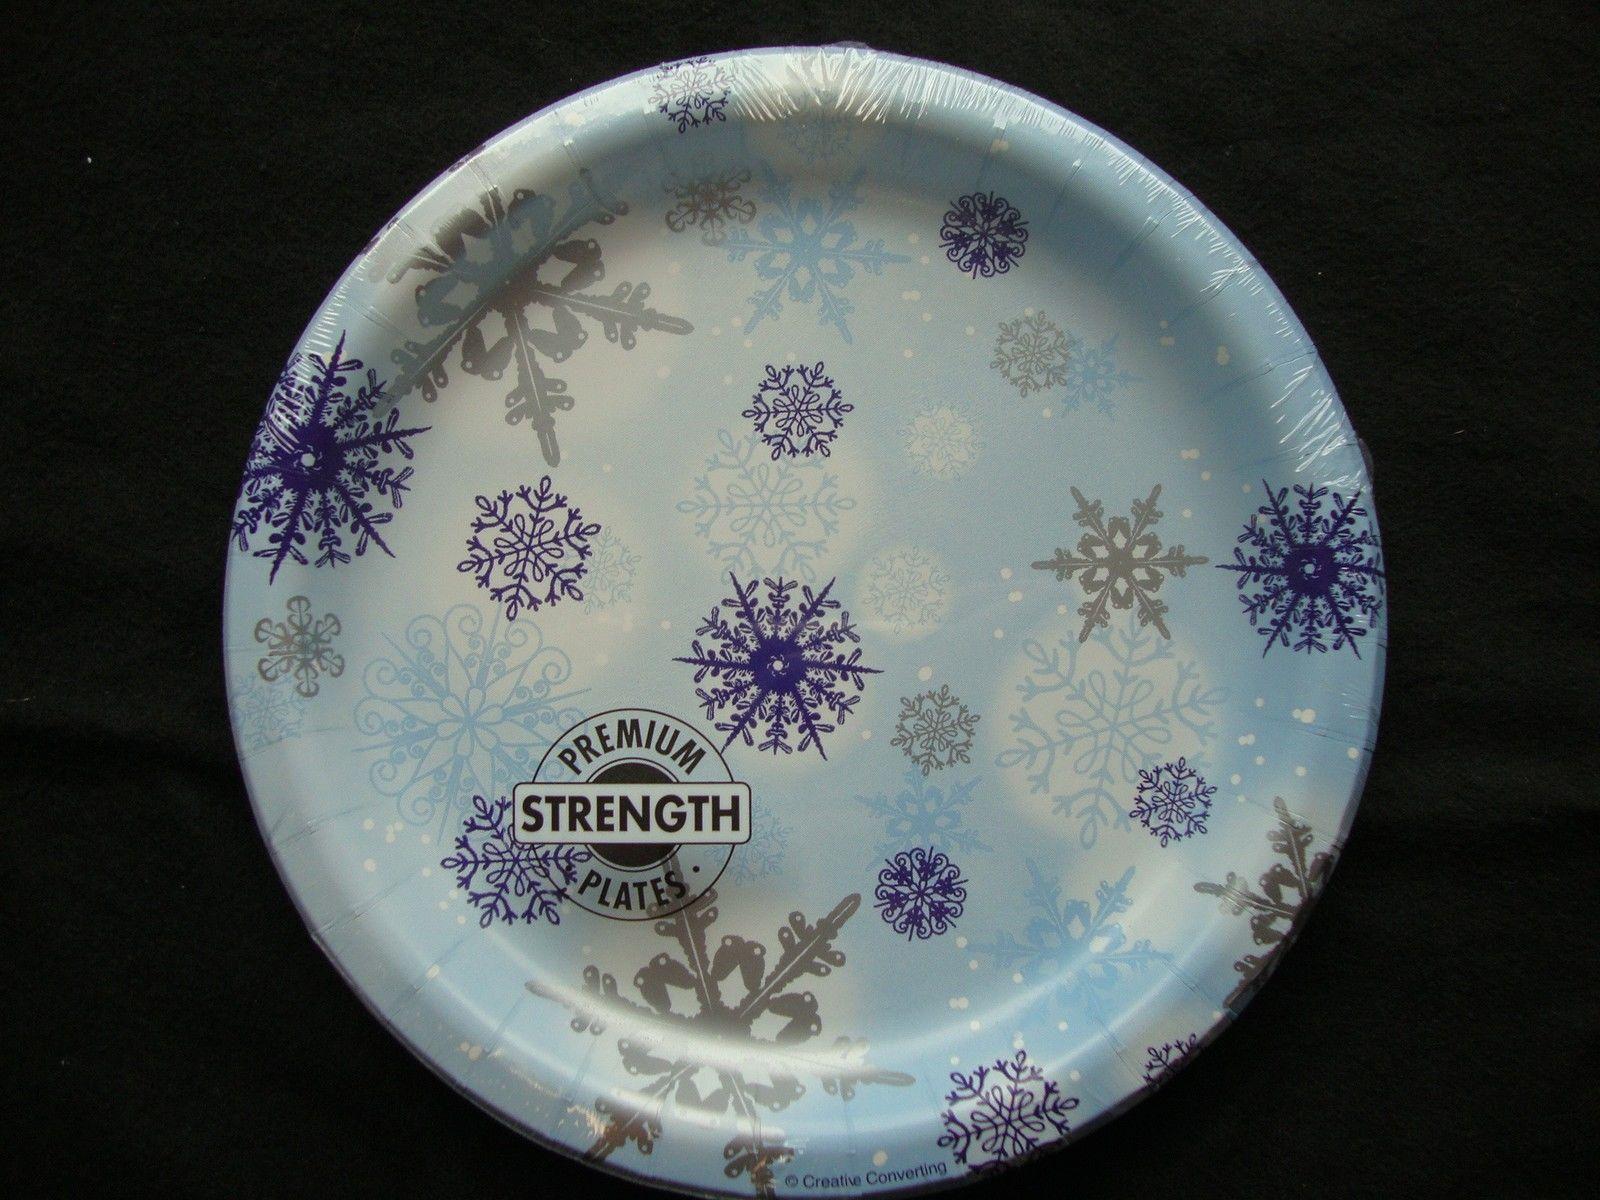 8 x Blue u0026 Silver Snowflakes paper Plates Christmas Buffet Dessert Plates & 8 x Blue u0026 Silver Snowflakes paper Plates Christmas Buffet Dessert ...